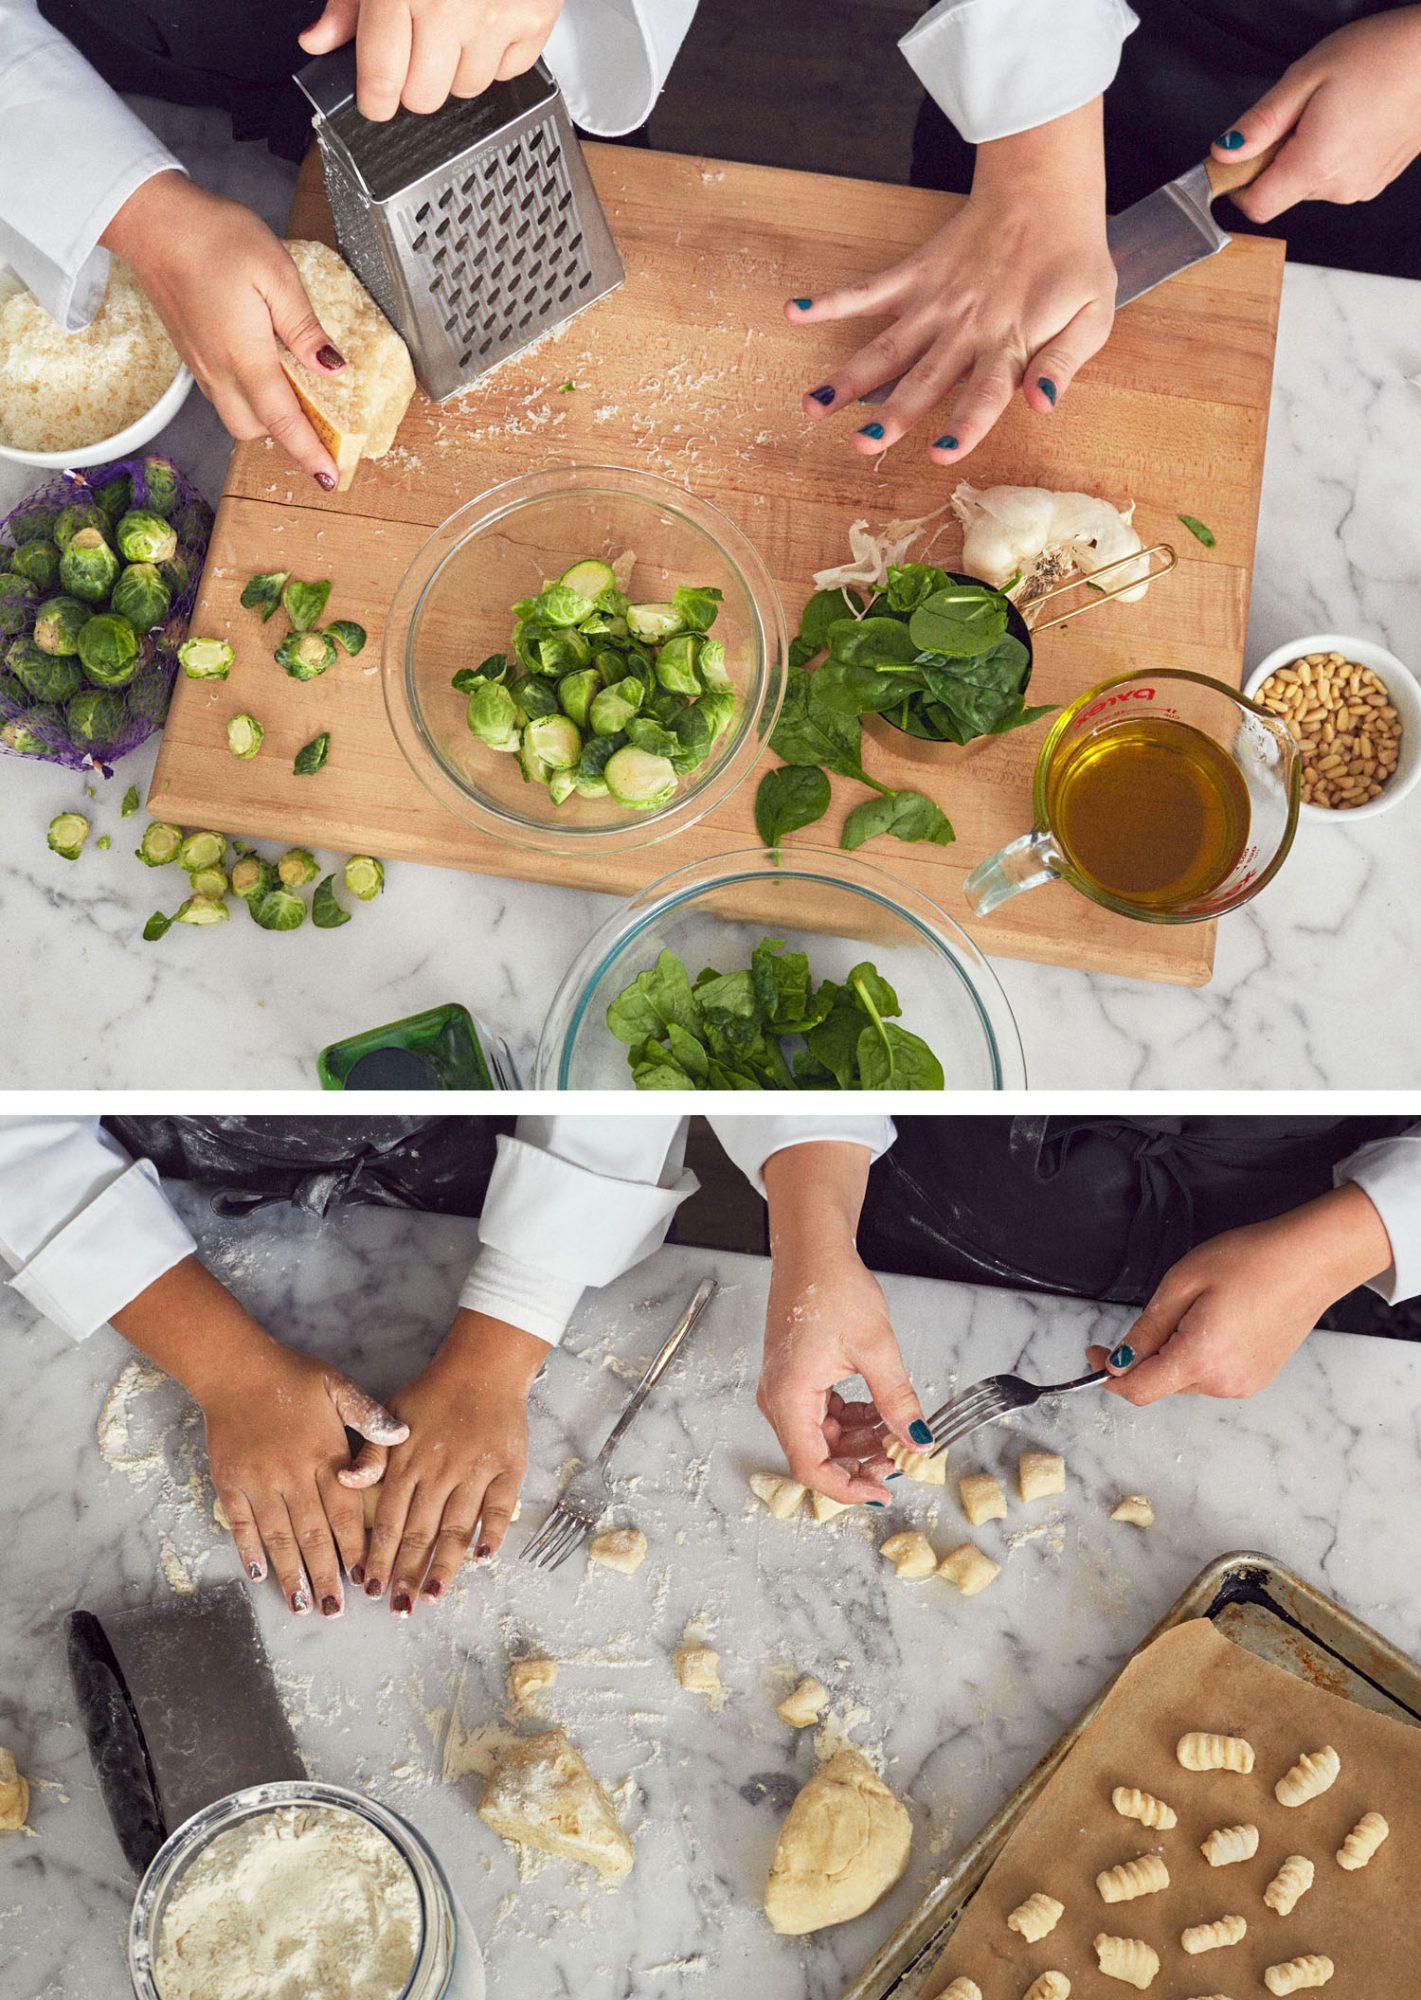 olivia acosta and nikki bidun make pesto and gnocchi